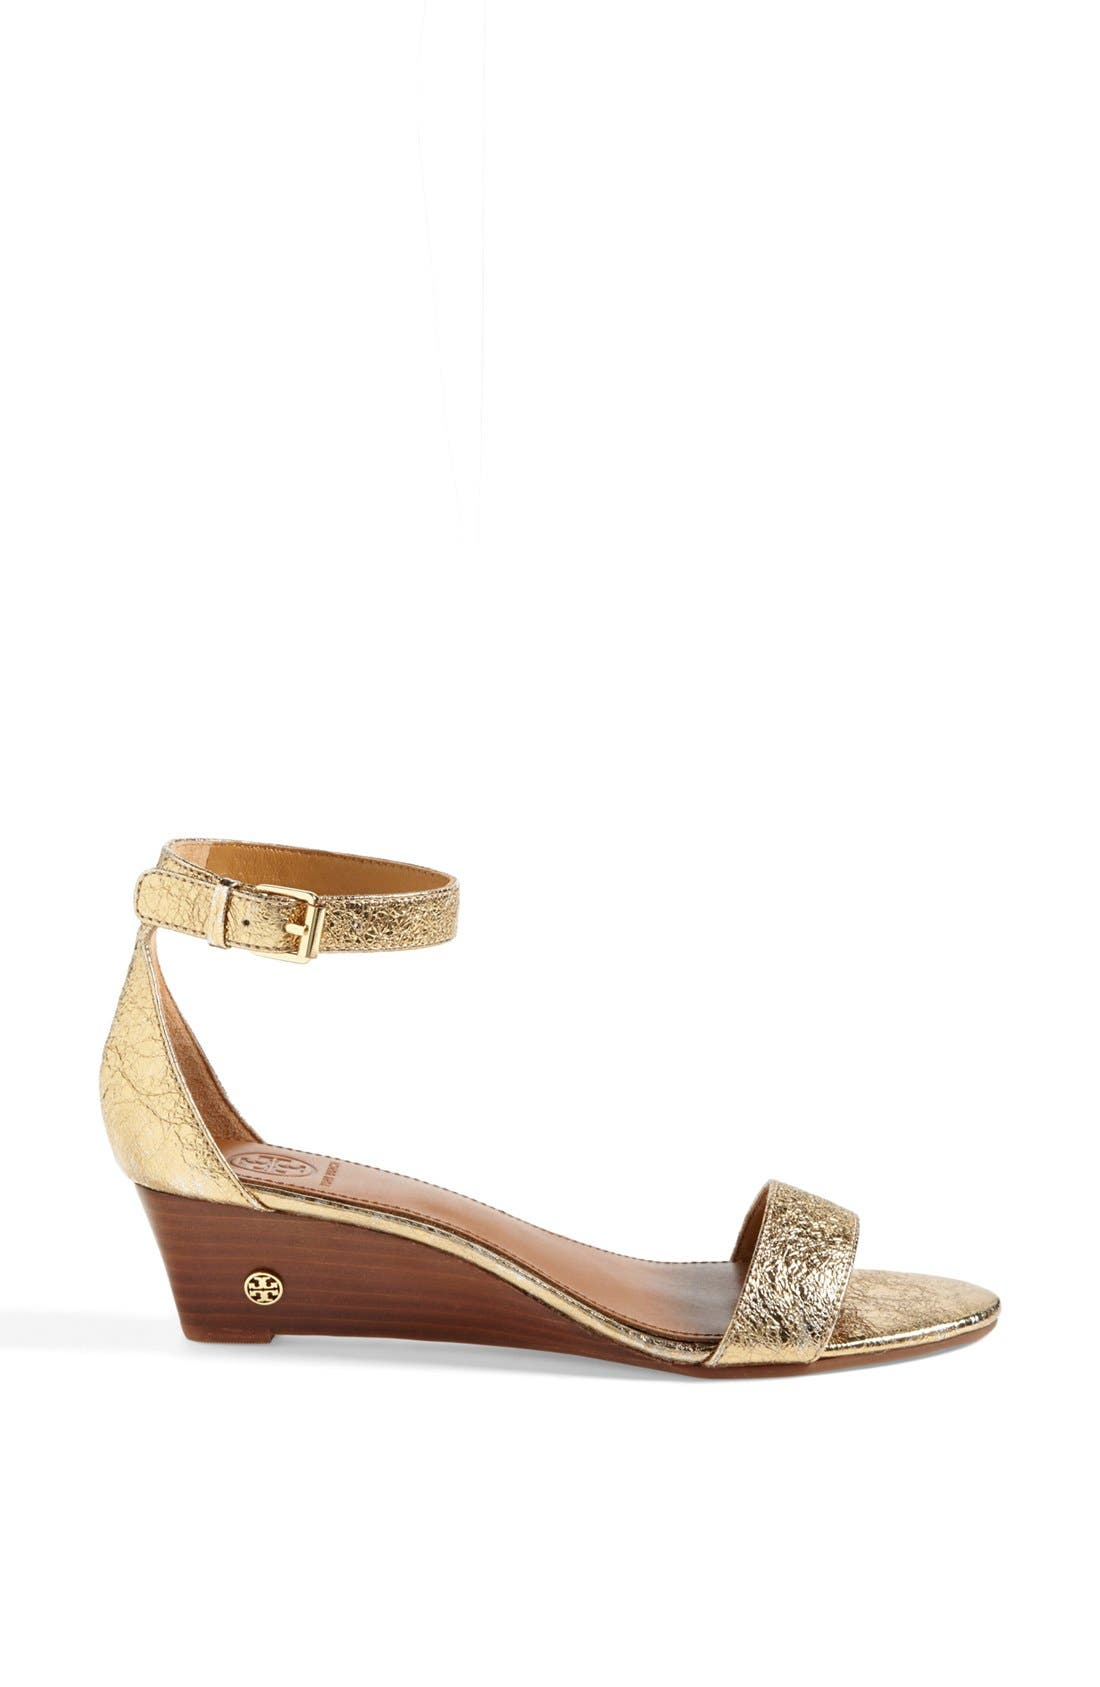 'Savannah' Wedge Sandal,                             Alternate thumbnail 4, color,                             Gold